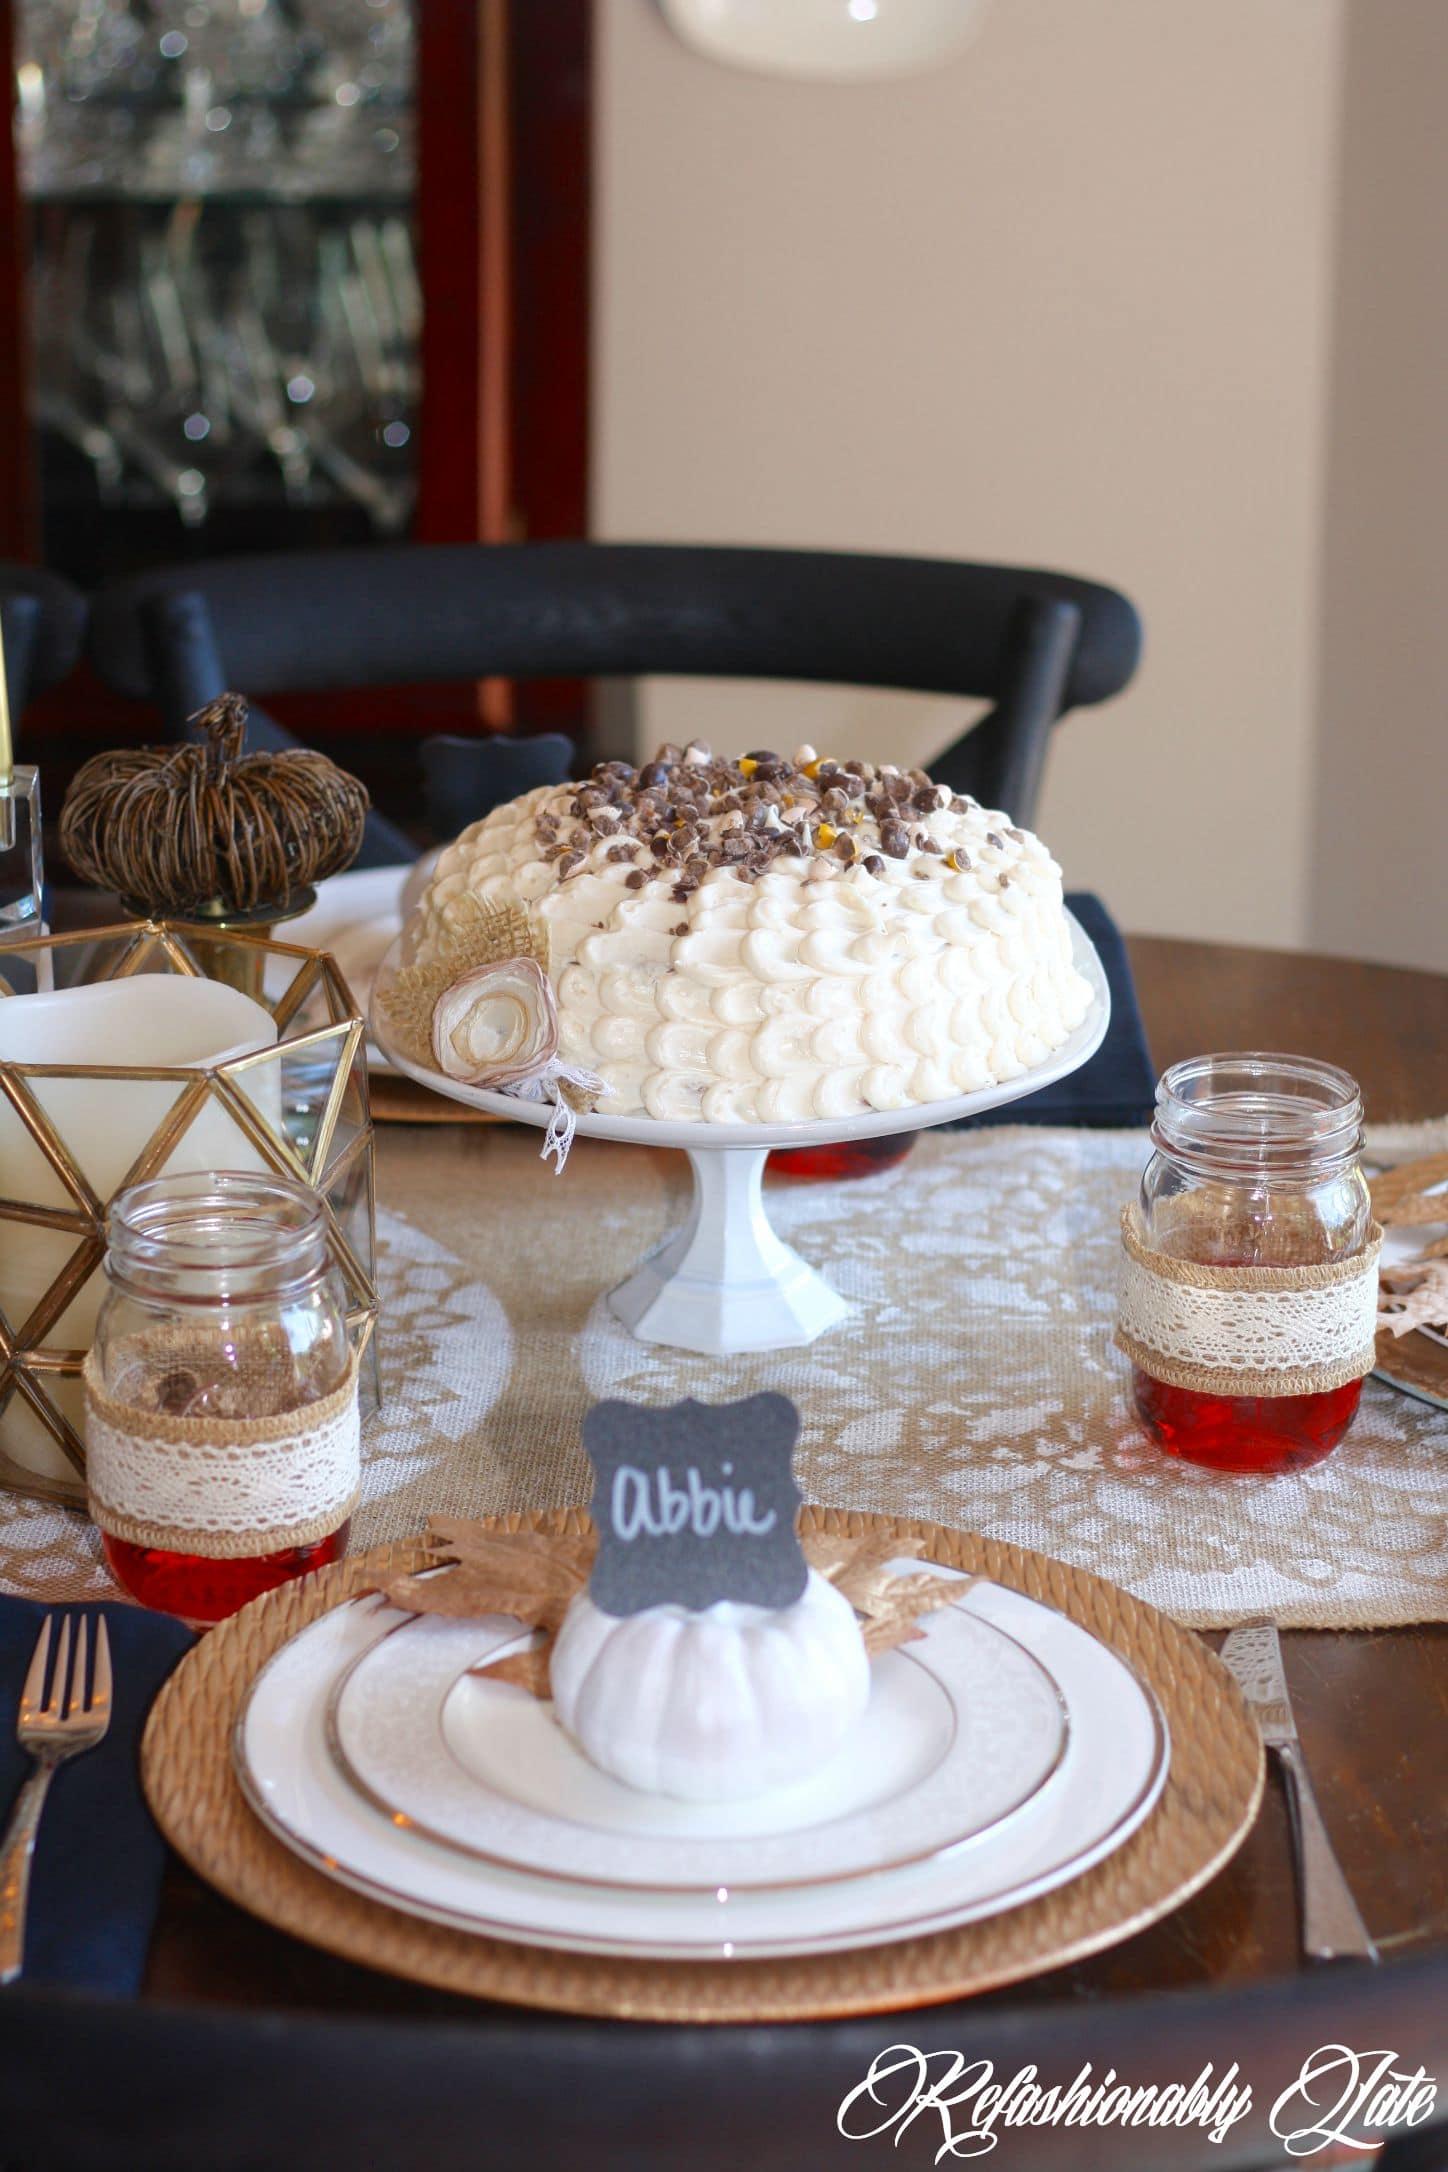 DIY Fall Place Cards & Pecan Pie Spice Cake - www.refashionablylate.com